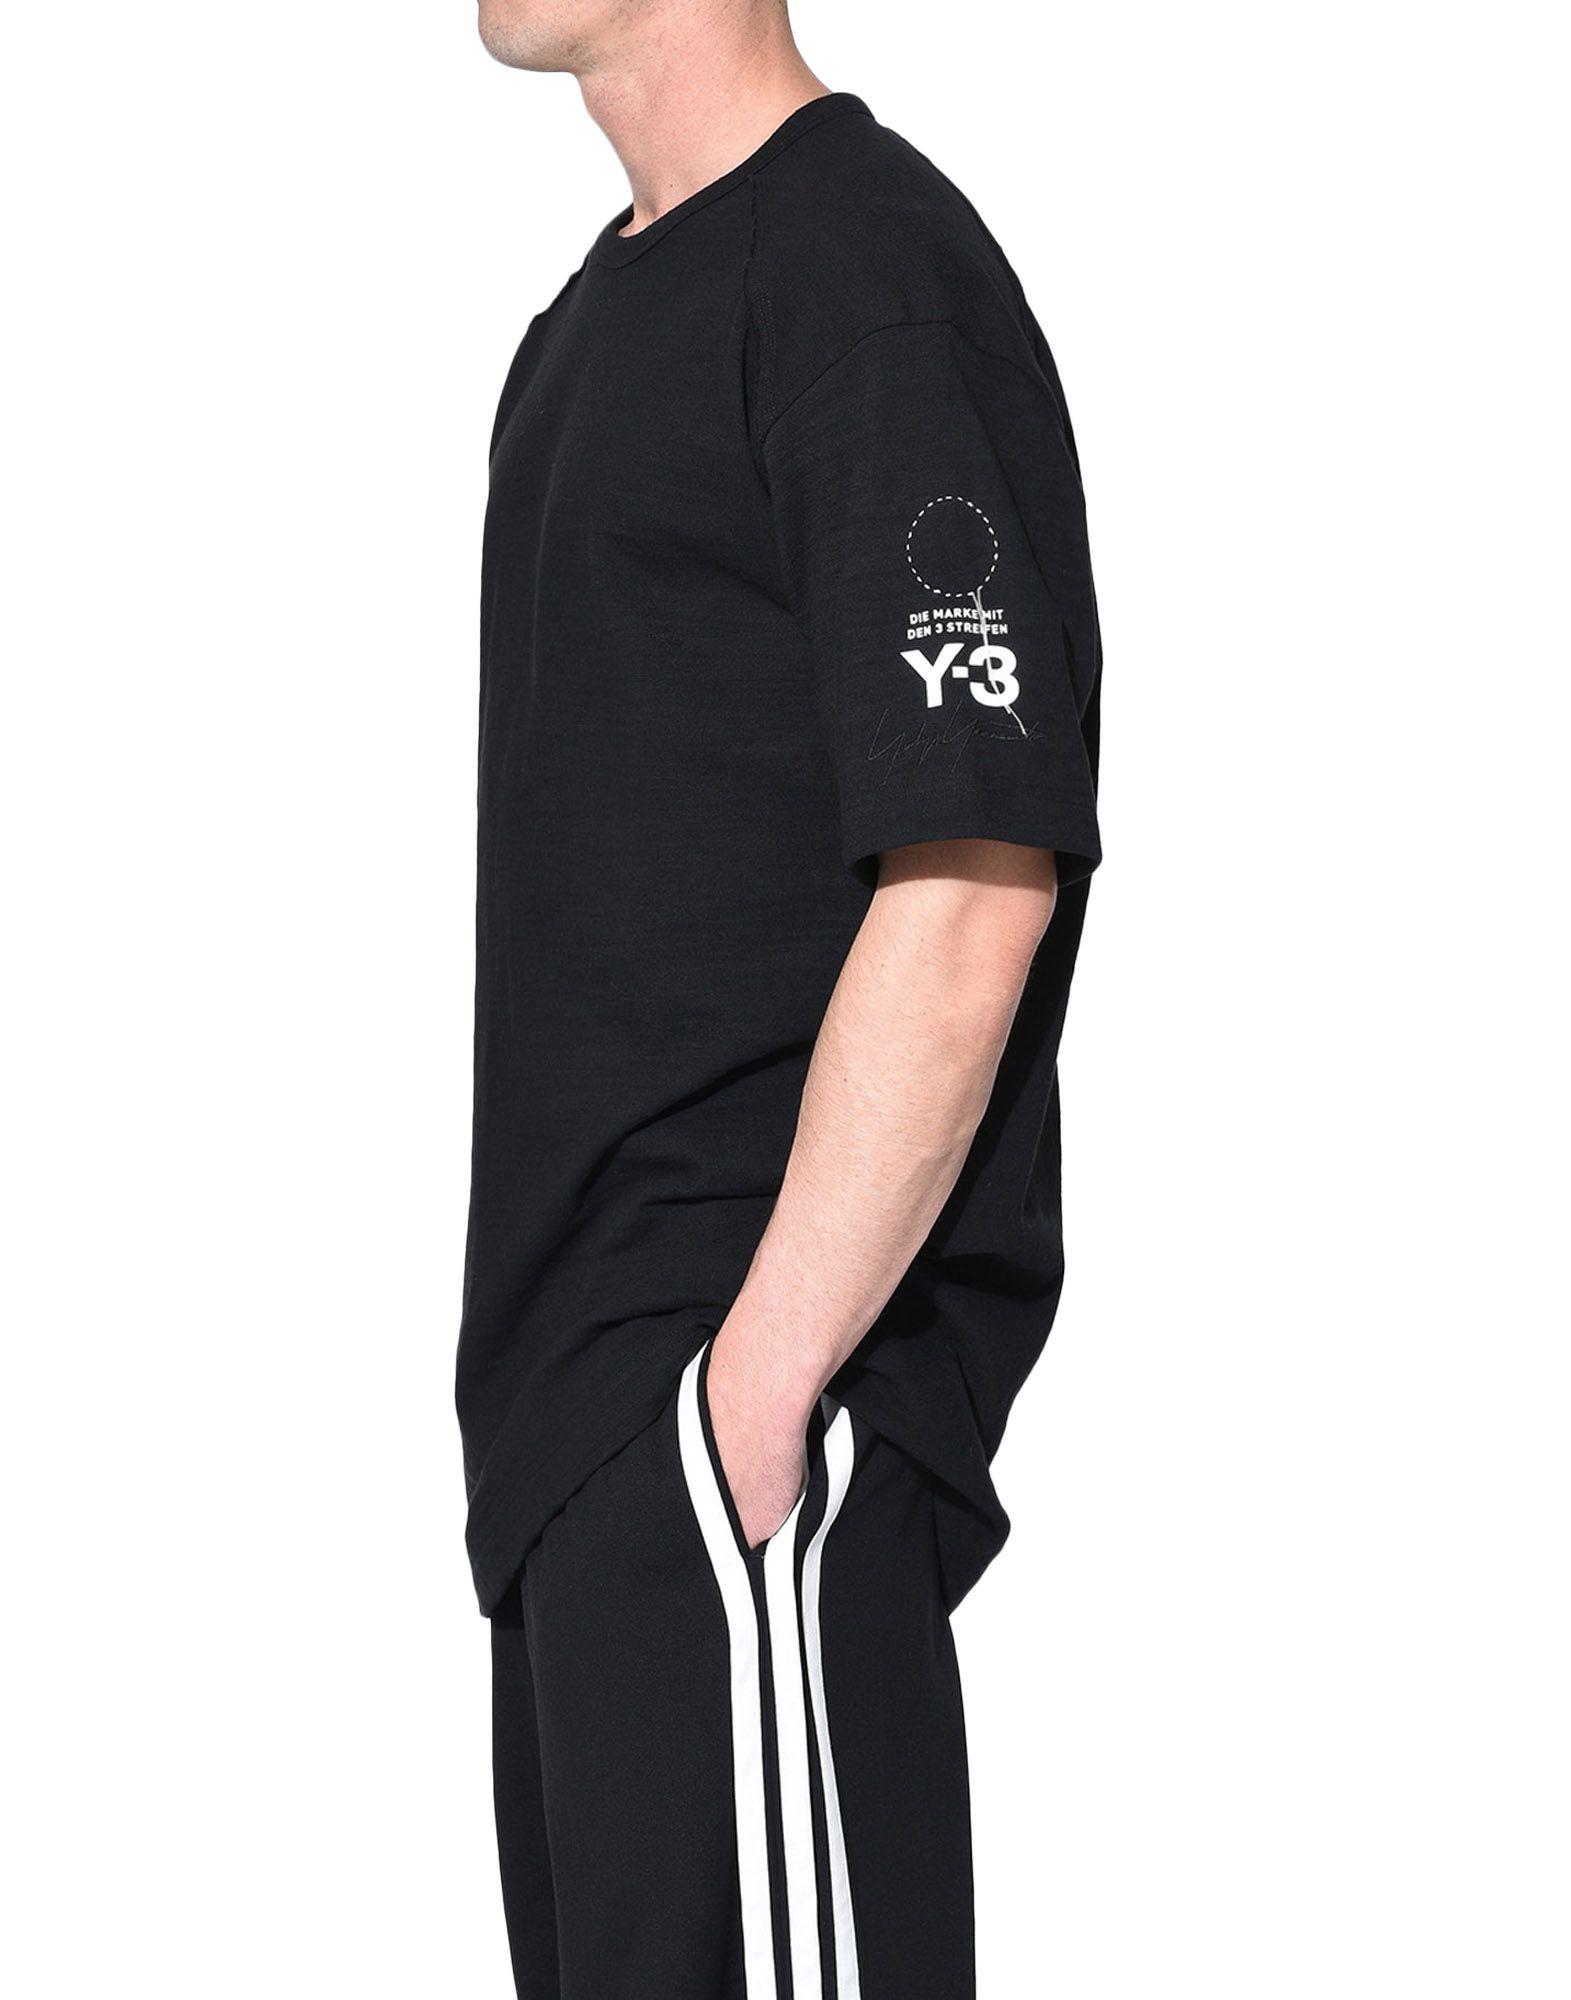 Y-3 Y-3 Sashiko Tee Short sleeve t-shirt Man e